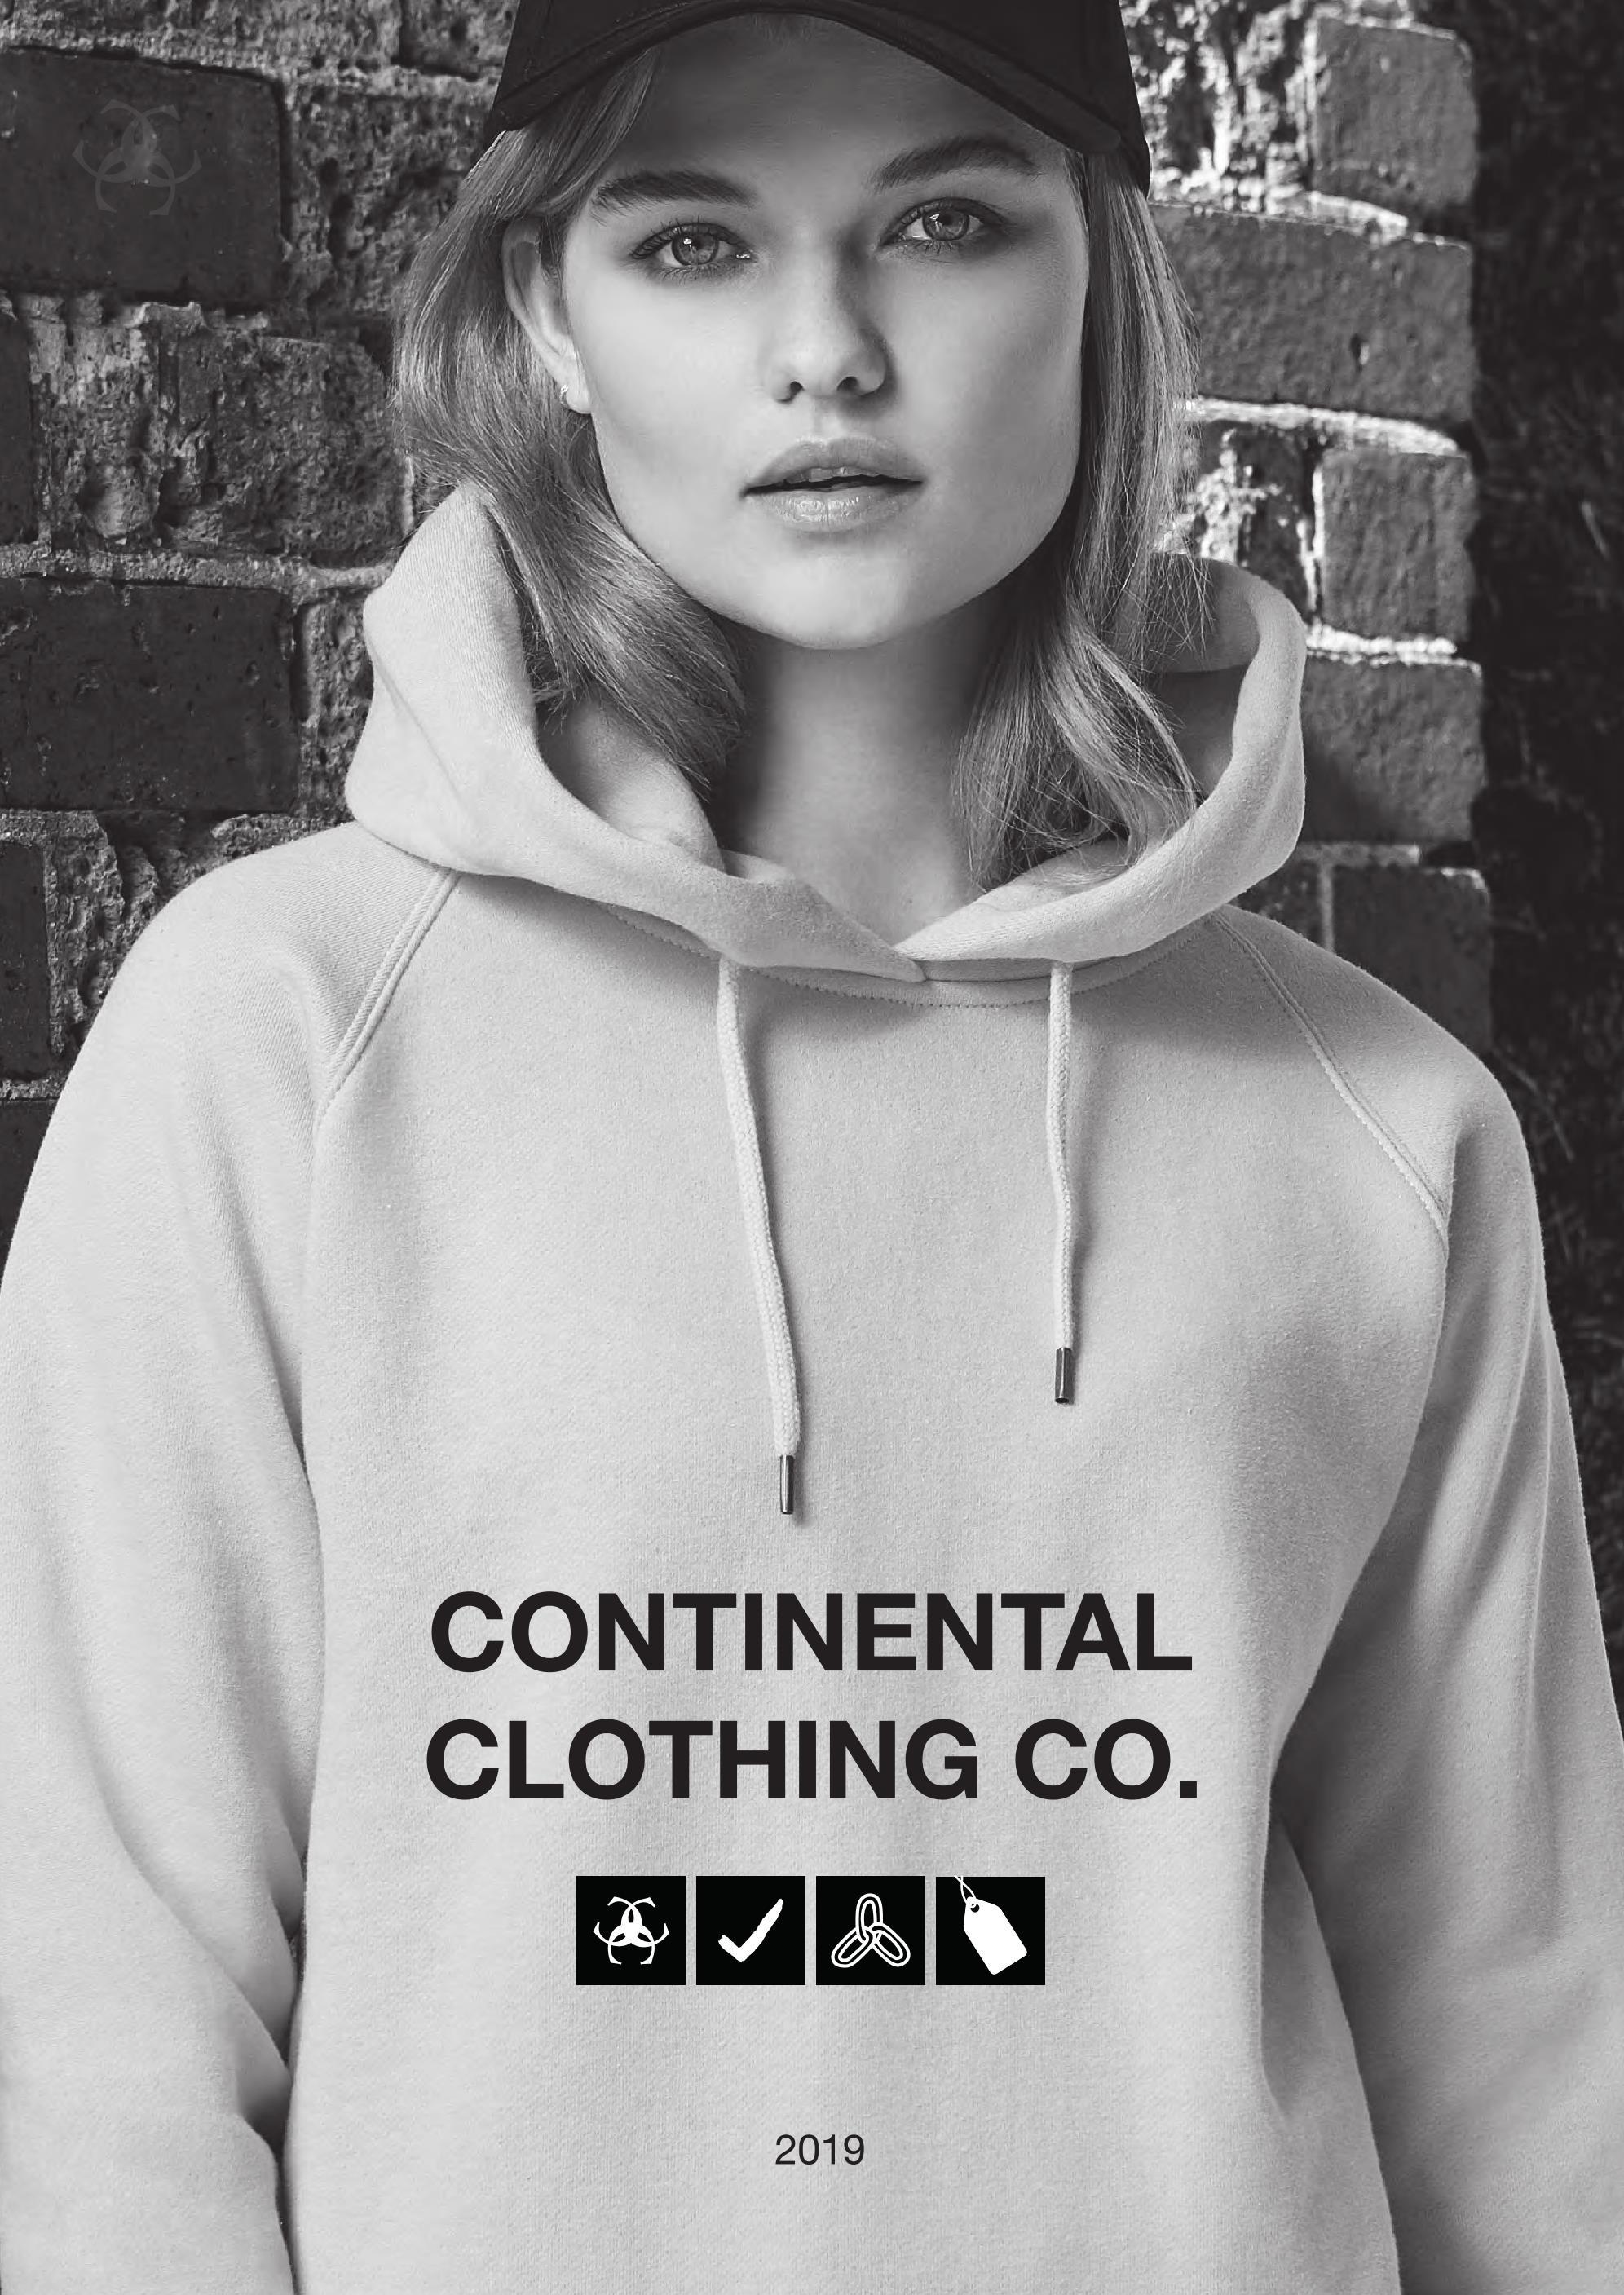 ContinentalClothing_2019.jpg